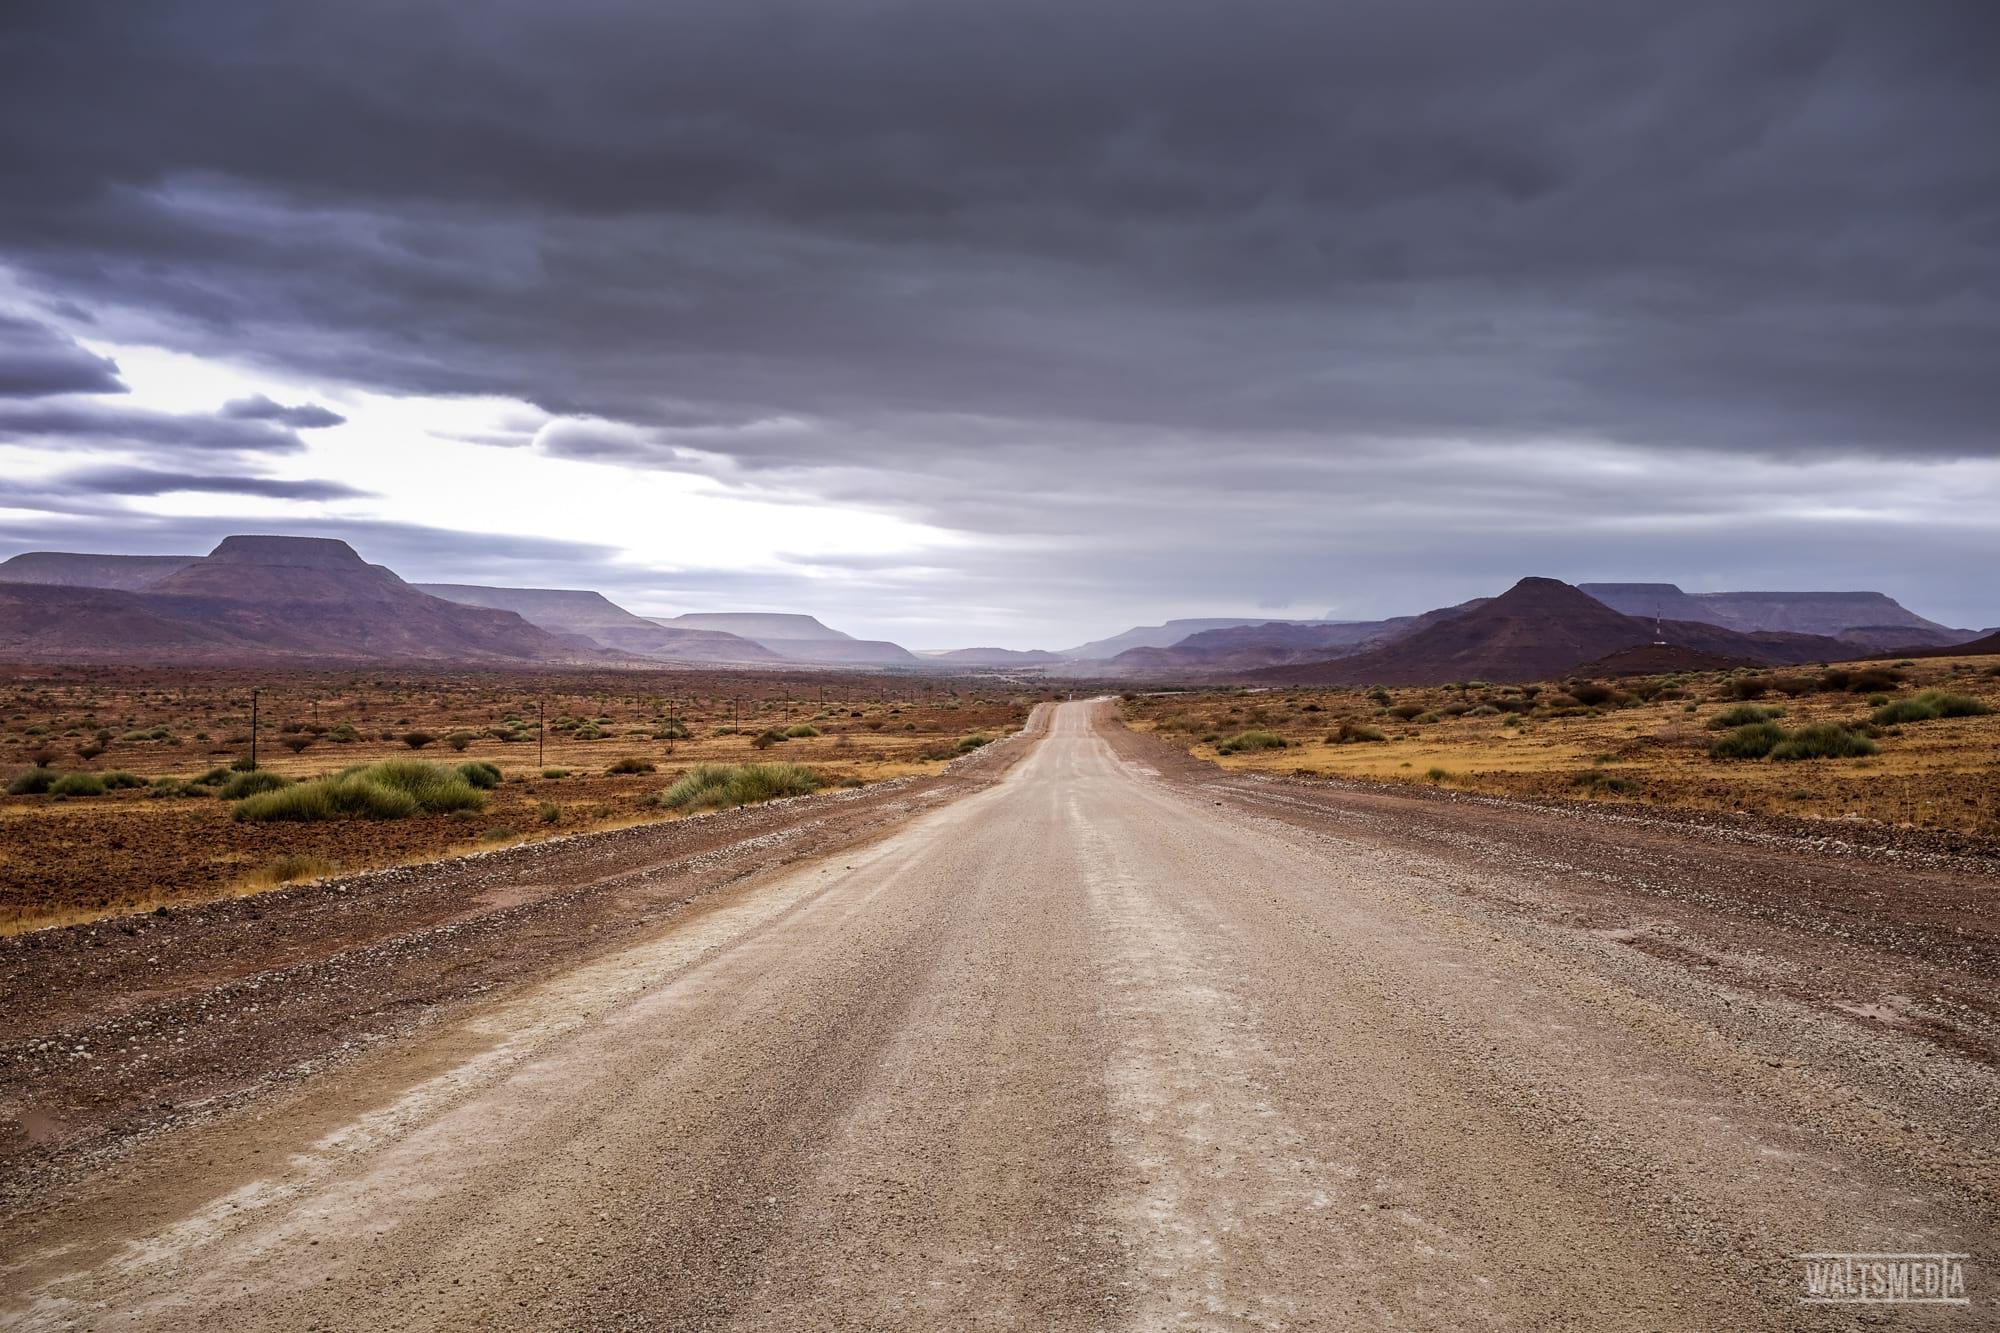 waltsmedia-namibia-travel-portrait-65-39